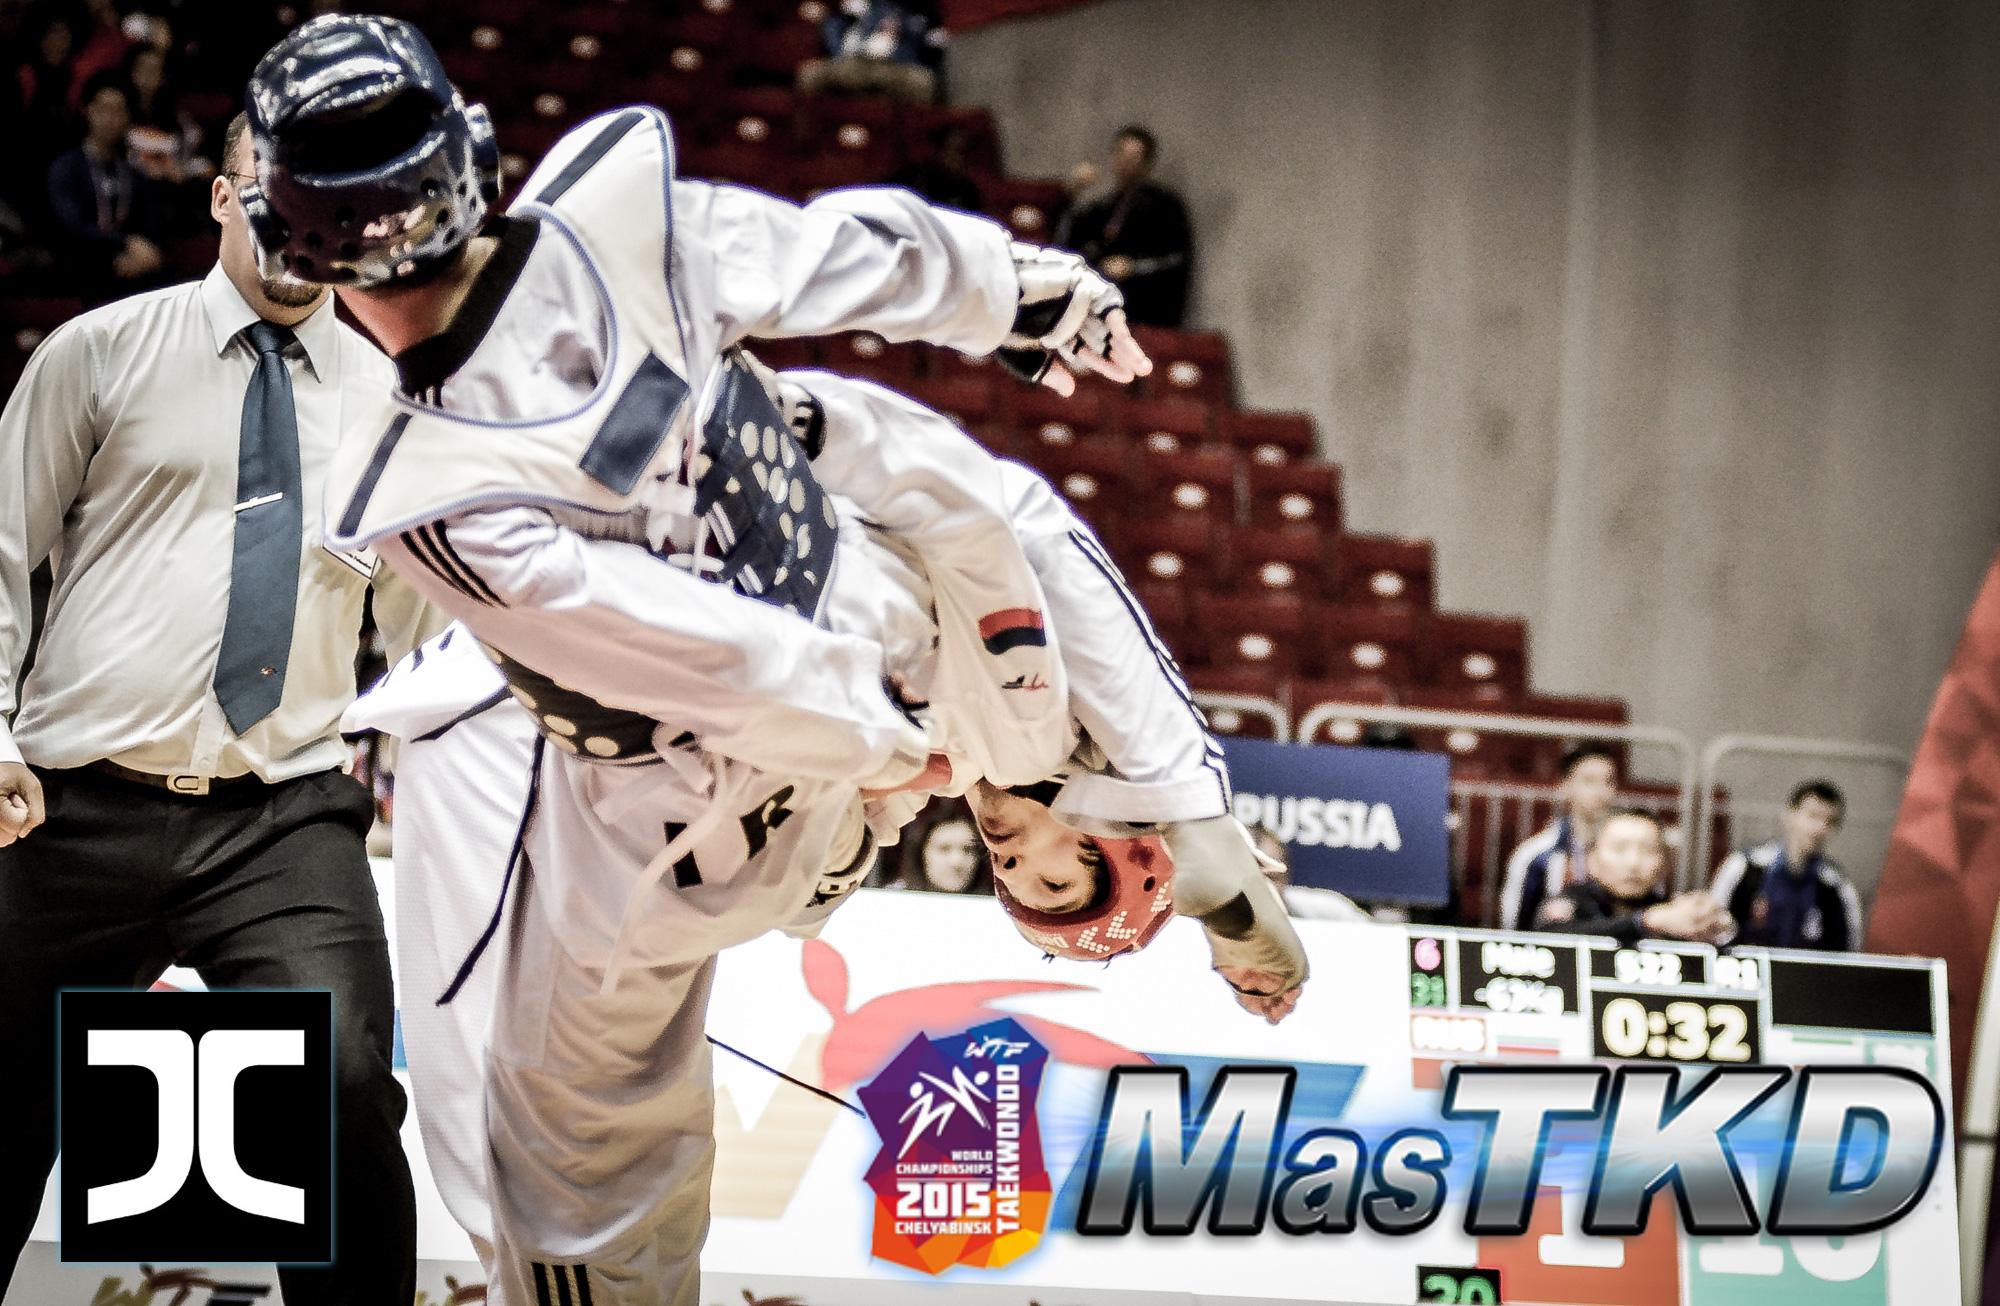 07_Mundial-Taekwondo_JCalicu-Seleccion-Mejor-Foto